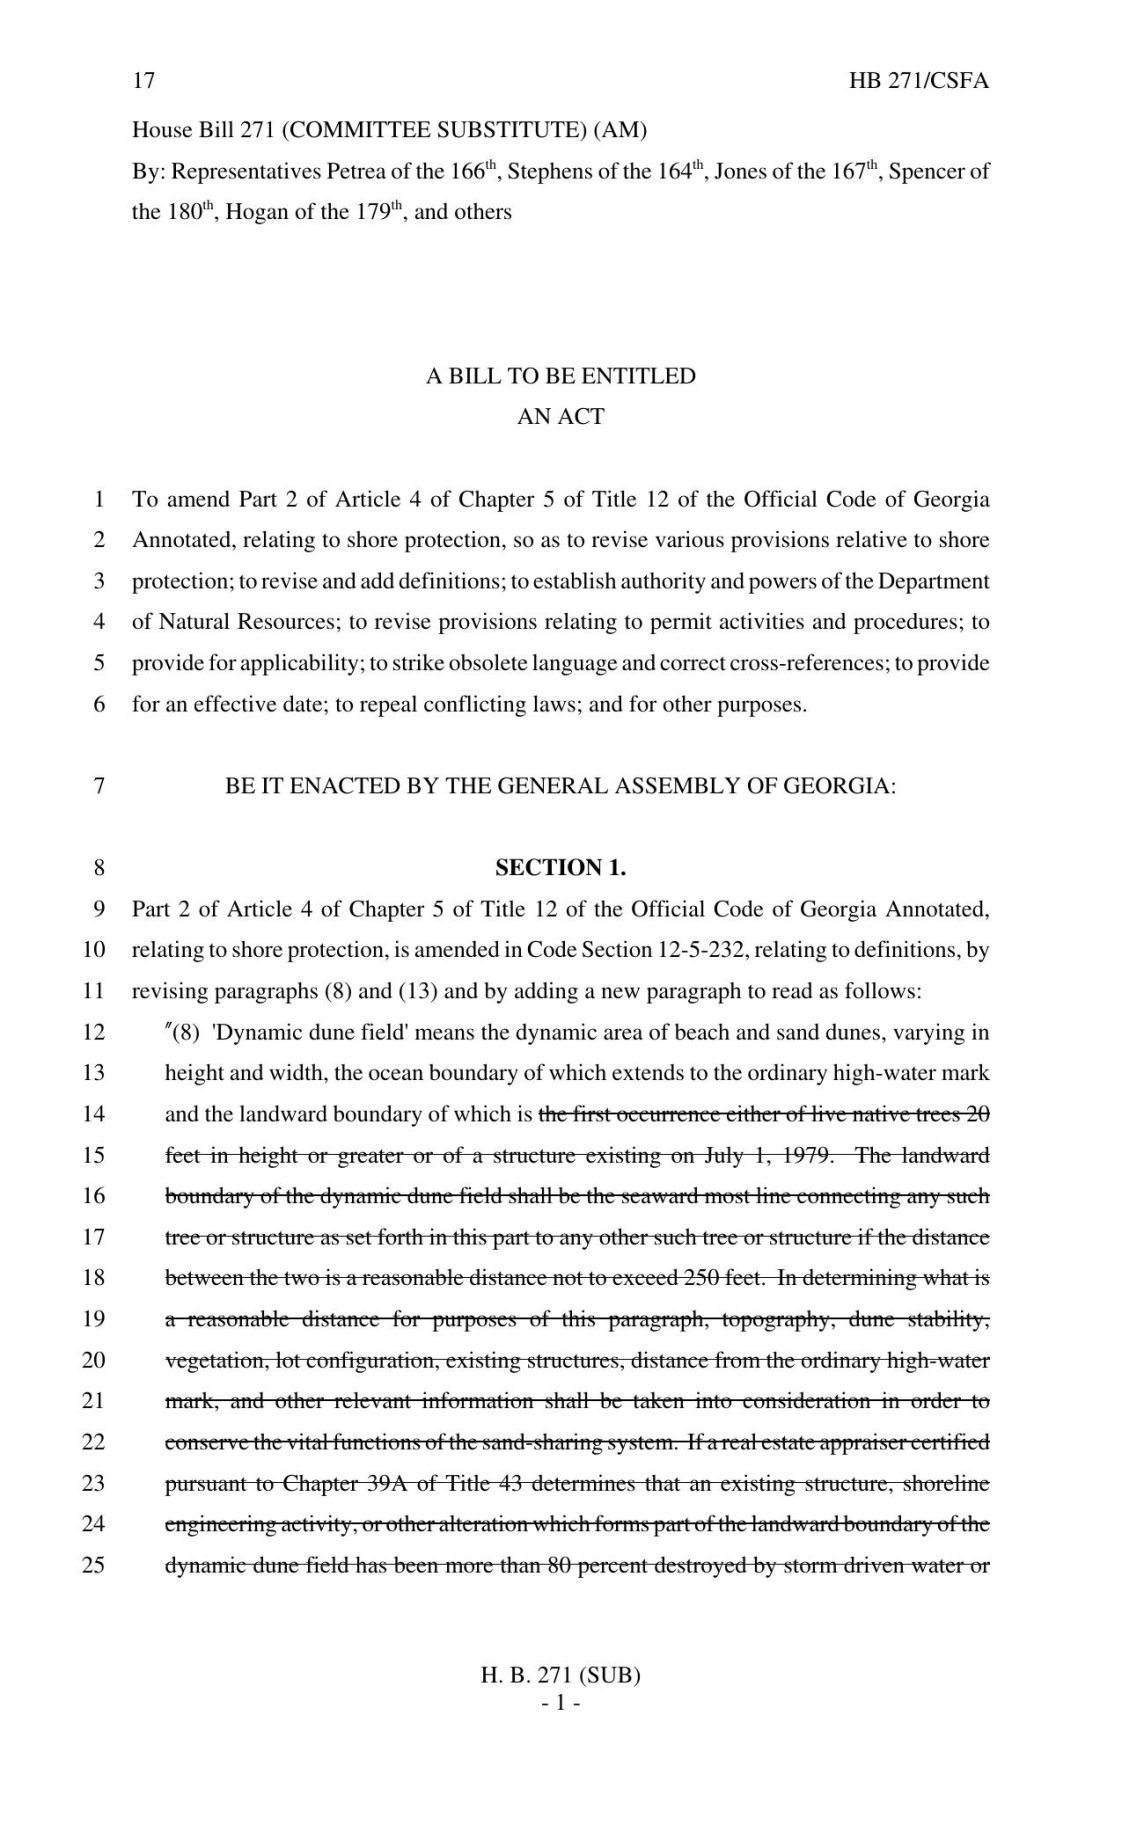 House Bill 271 (2018 Version)